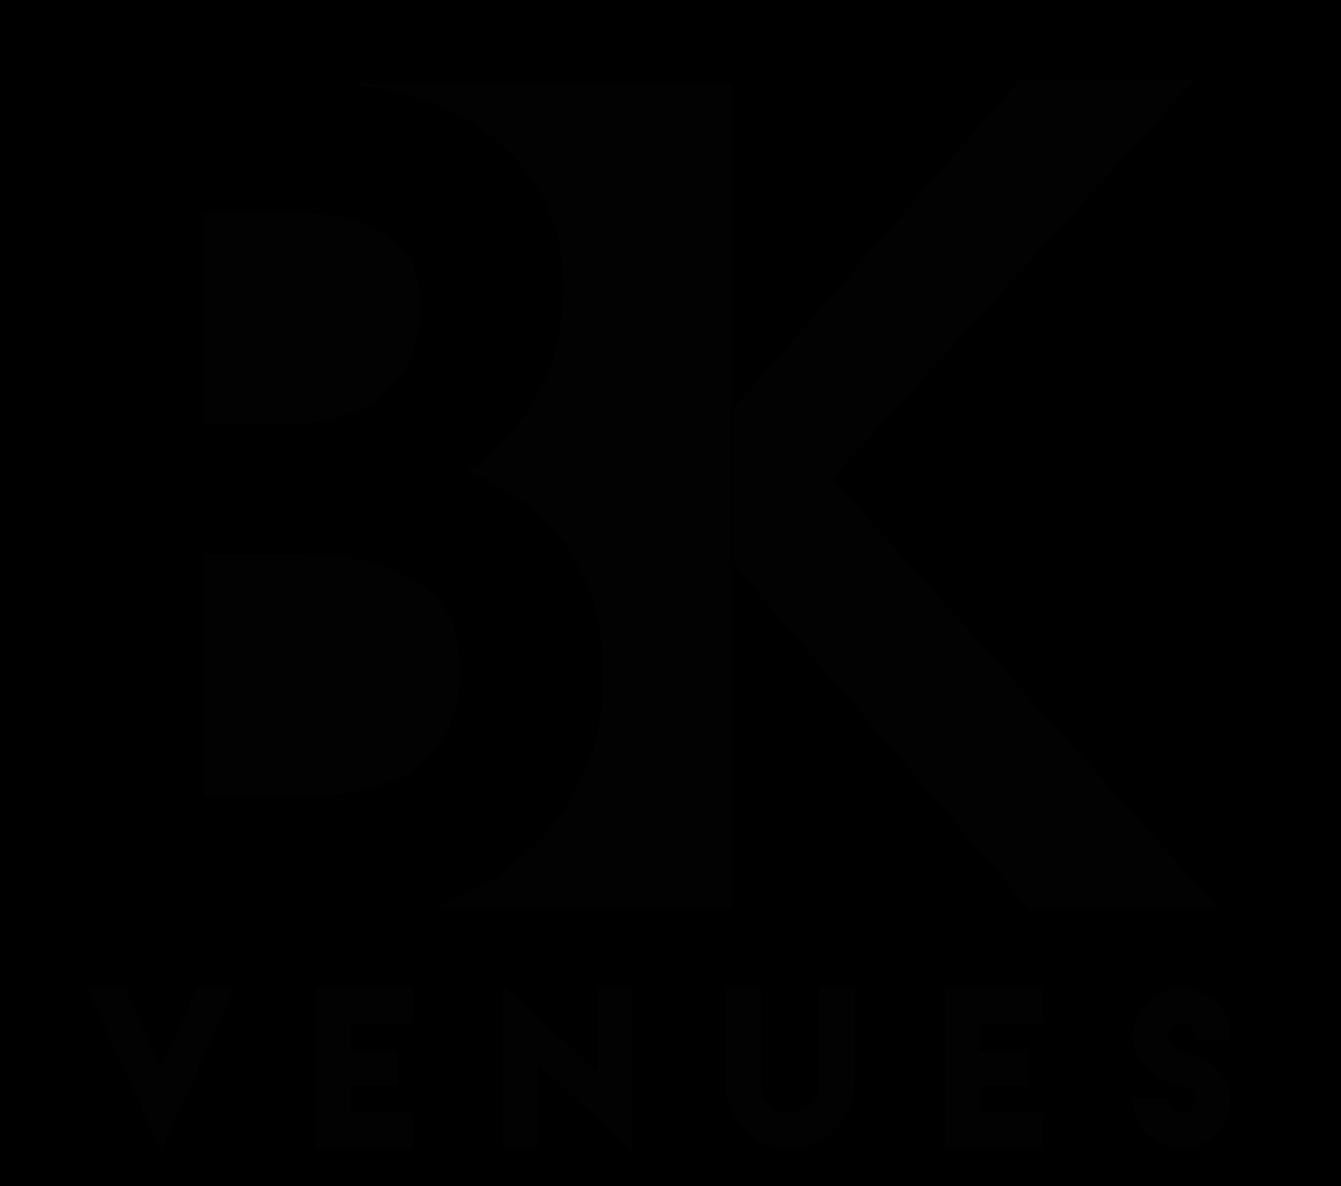 brooklyn-venues-center  logo 1 (2).jpg